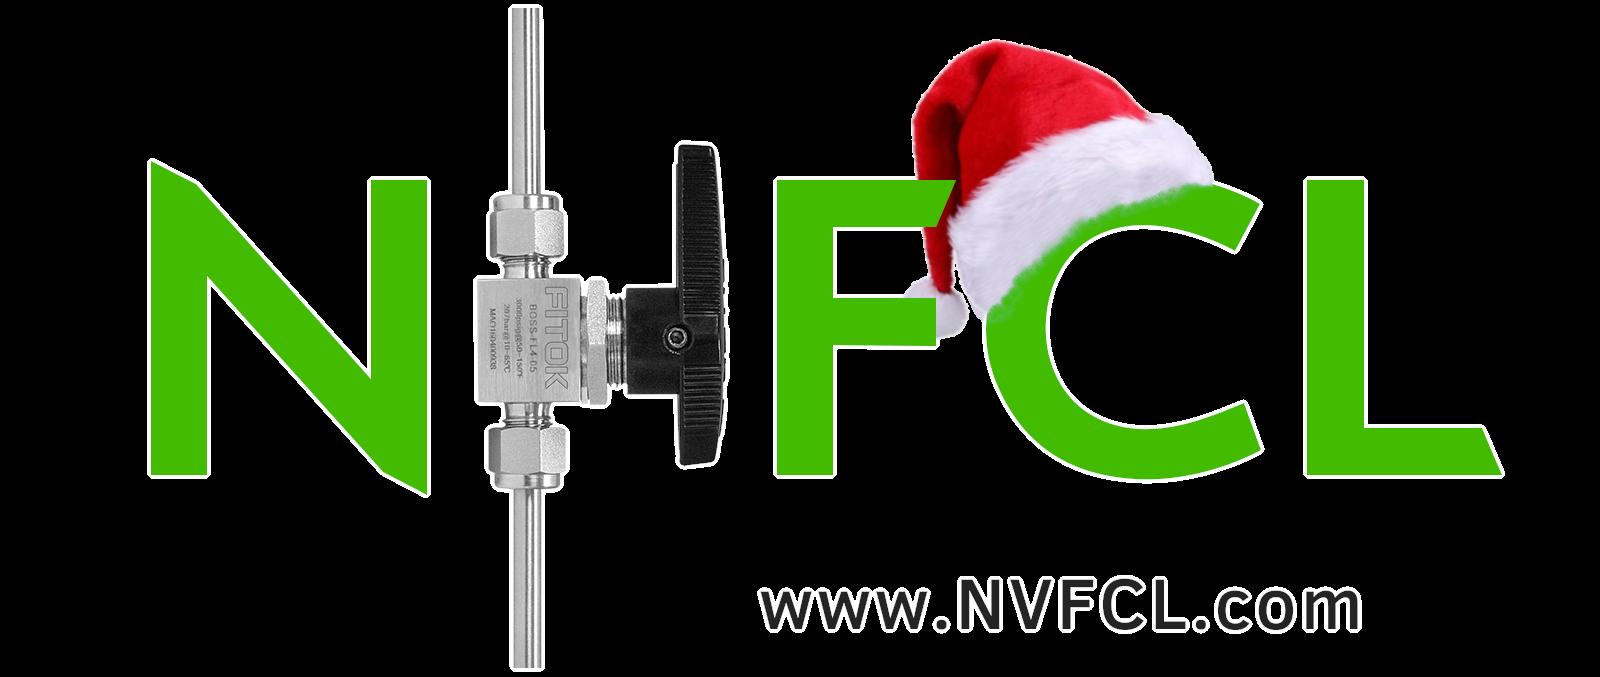 NVFCL-FITOK Valves & Twin Ferrule Fittings